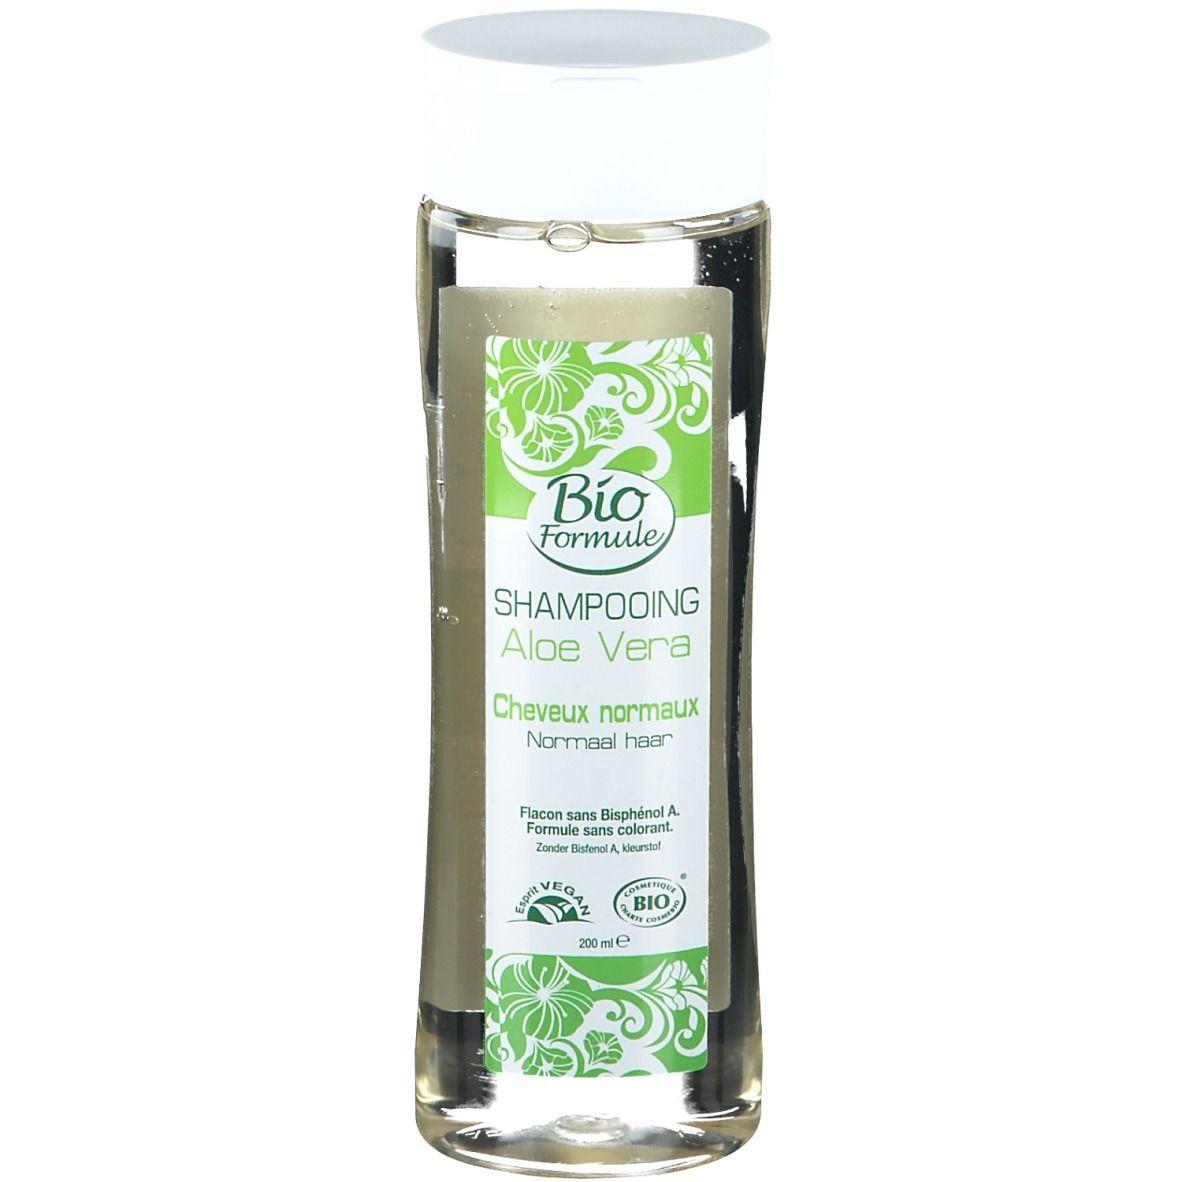 Bio Formule Shampooing Aloe vera ml shampooing